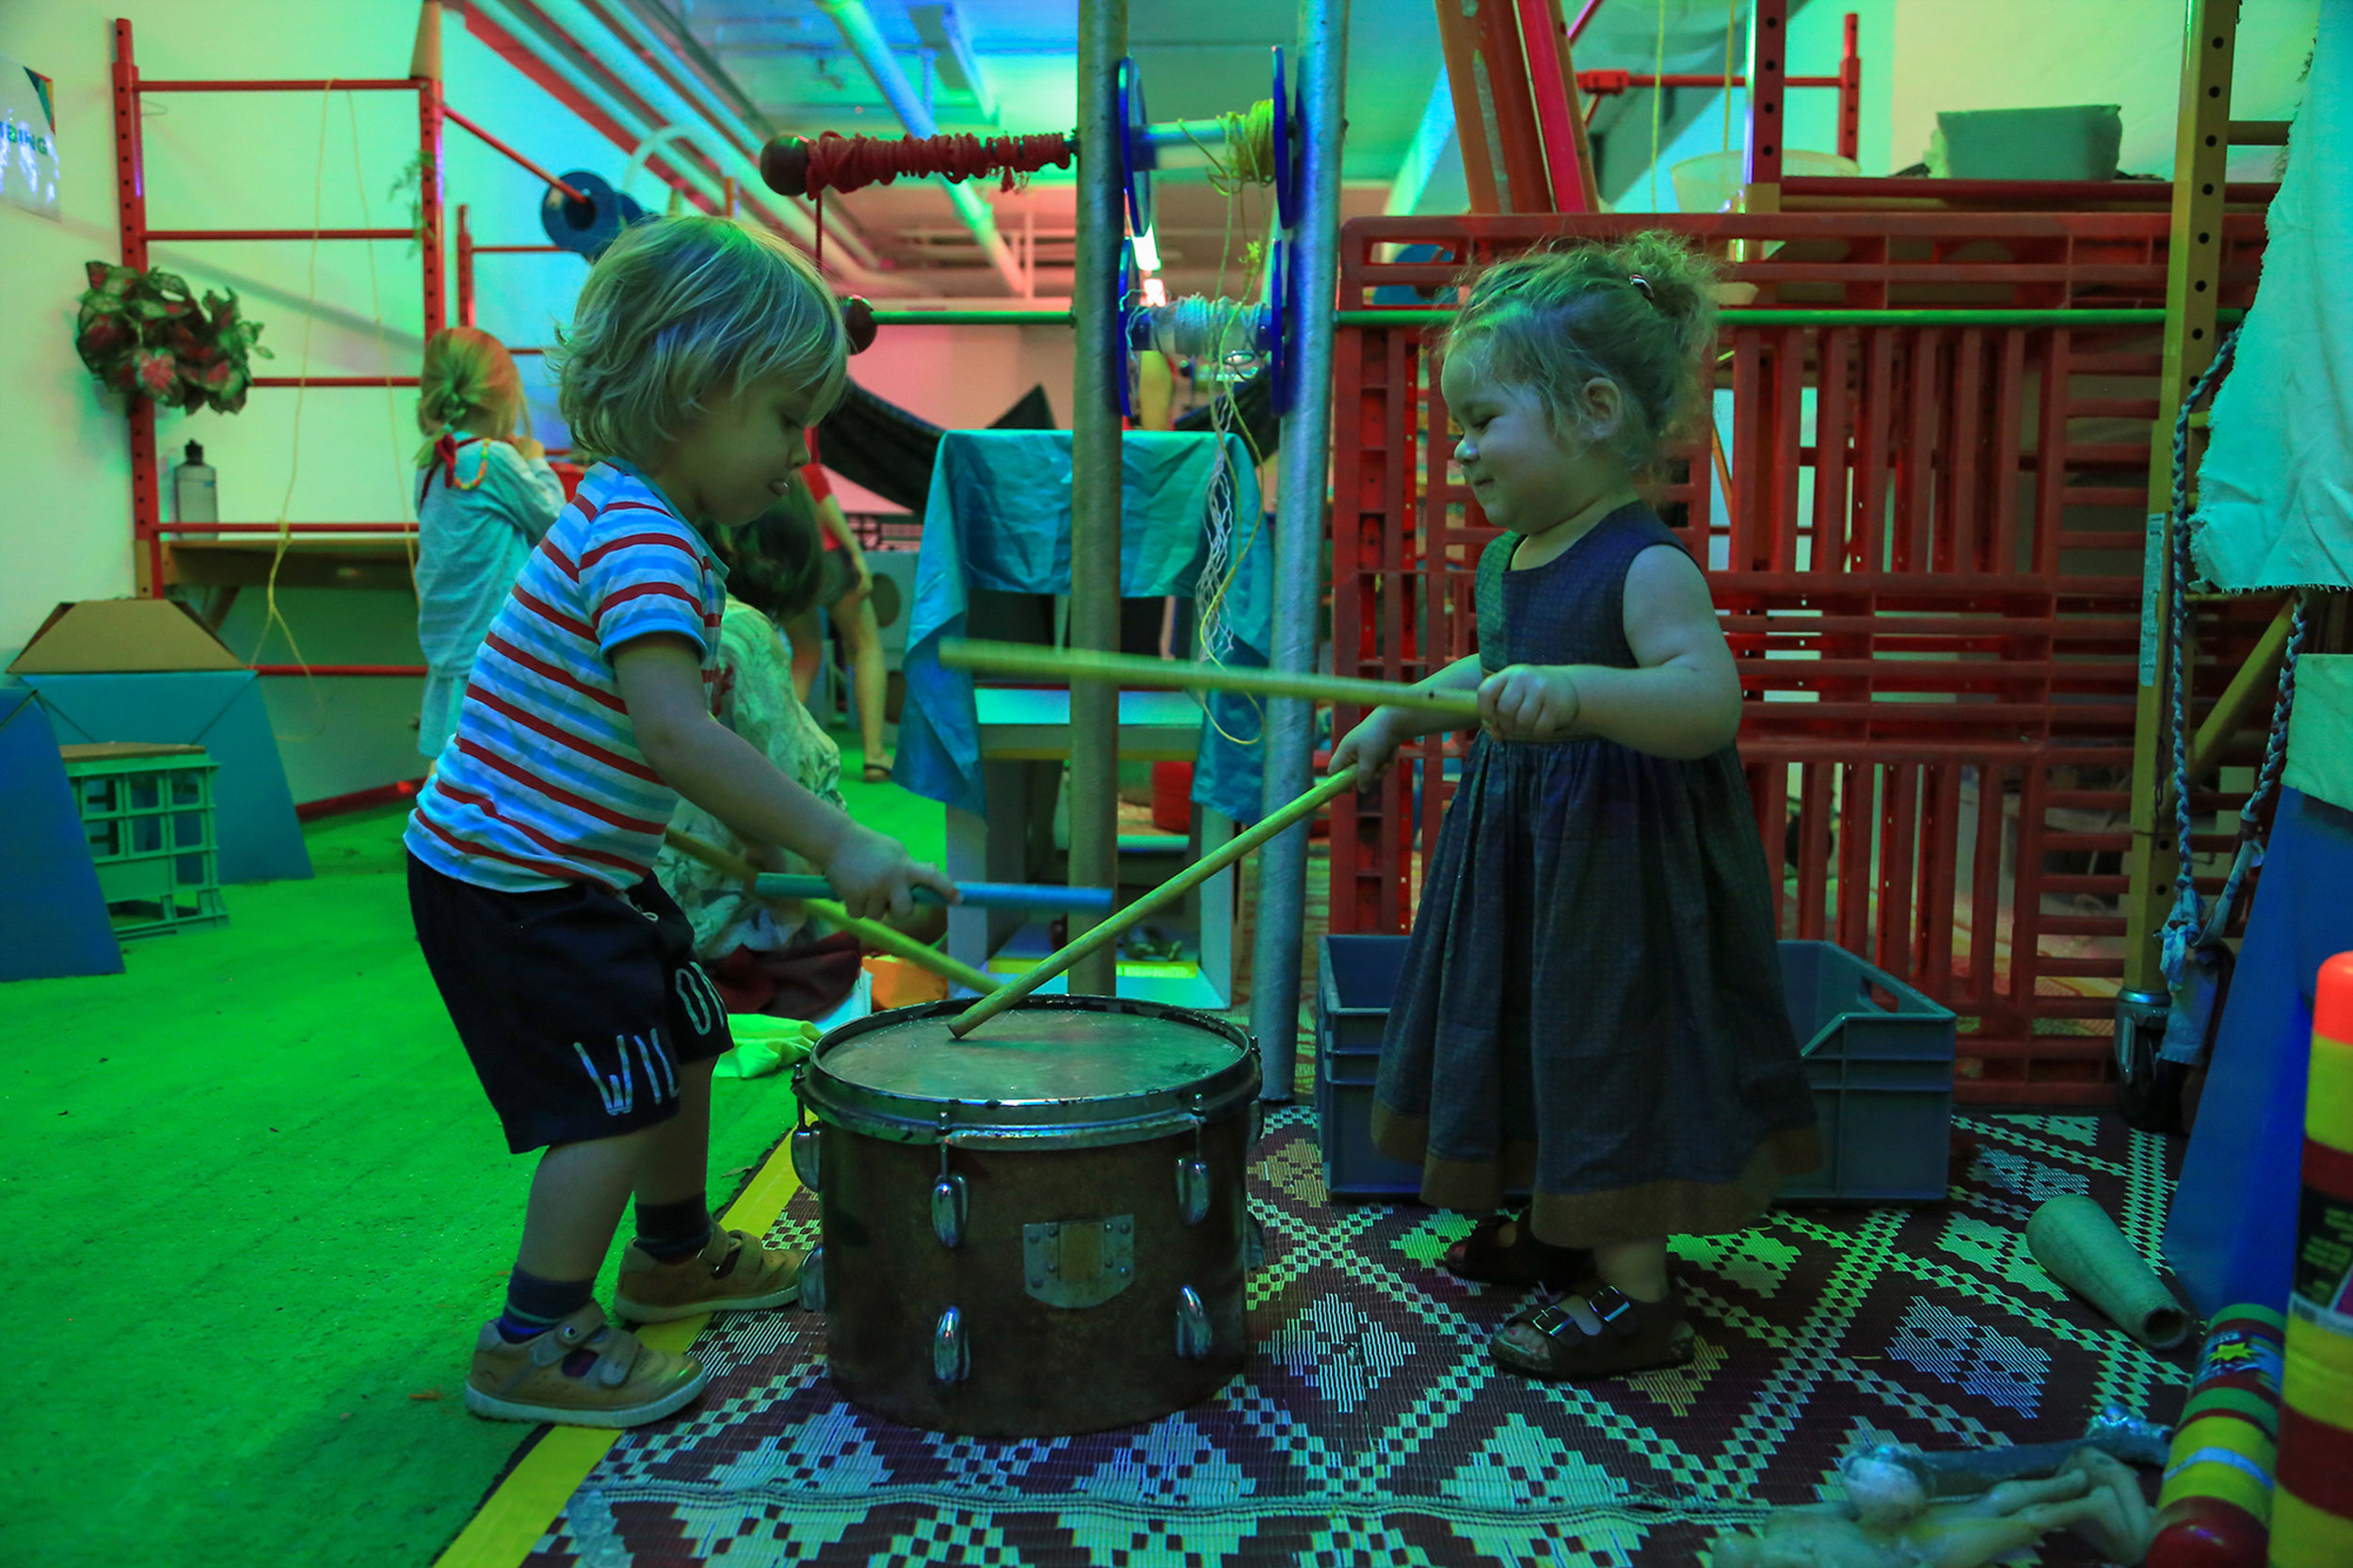 triev and yoann drum.jpg